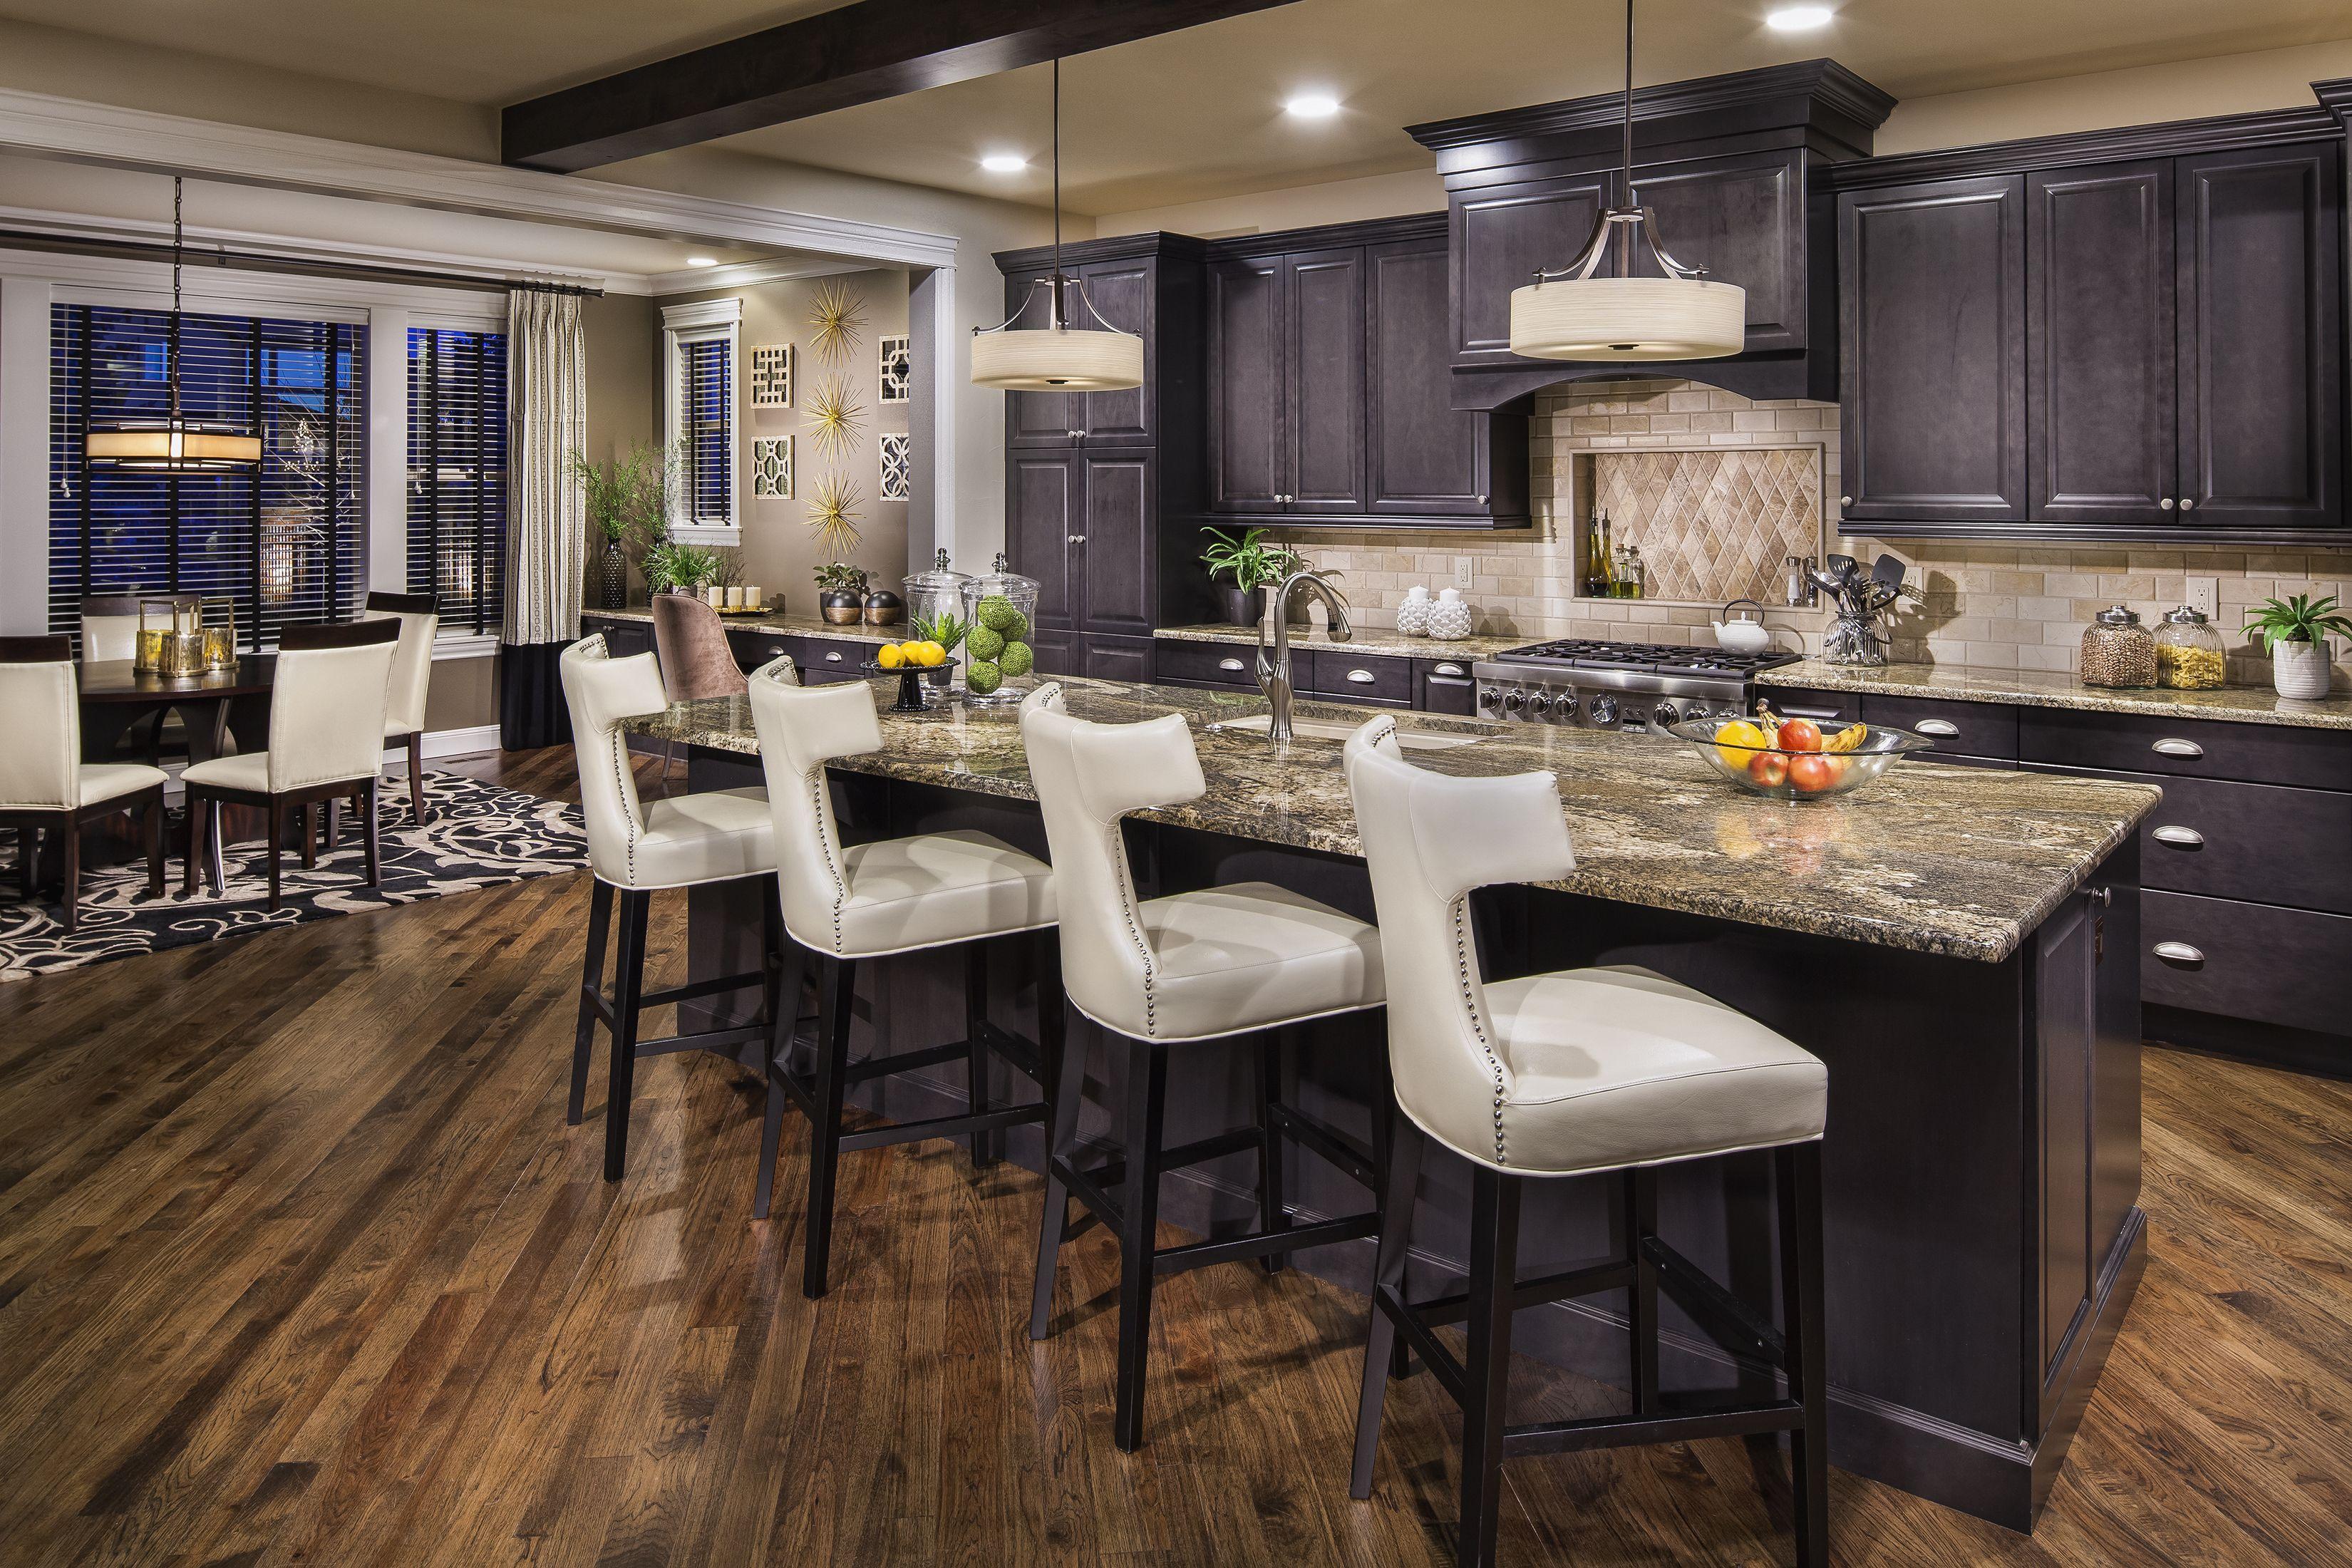 berardi residence kitchen custom interior design luxury interior design denver interior on kitchen interior luxury id=82355